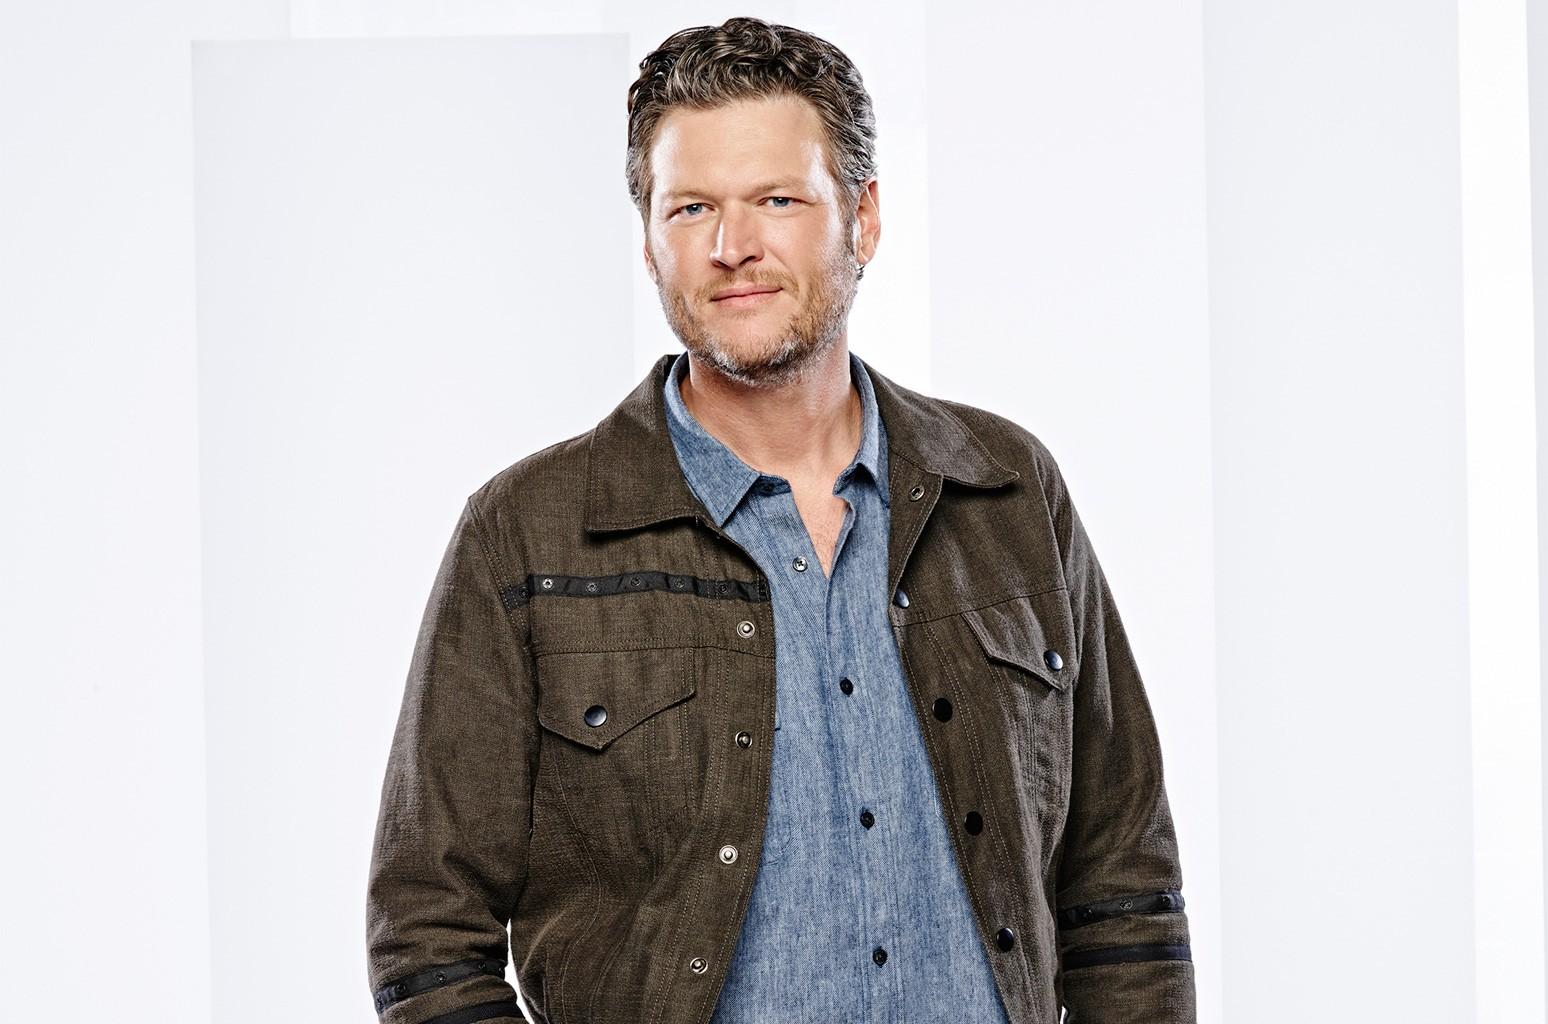 Blake Shelton photographed in 2015.